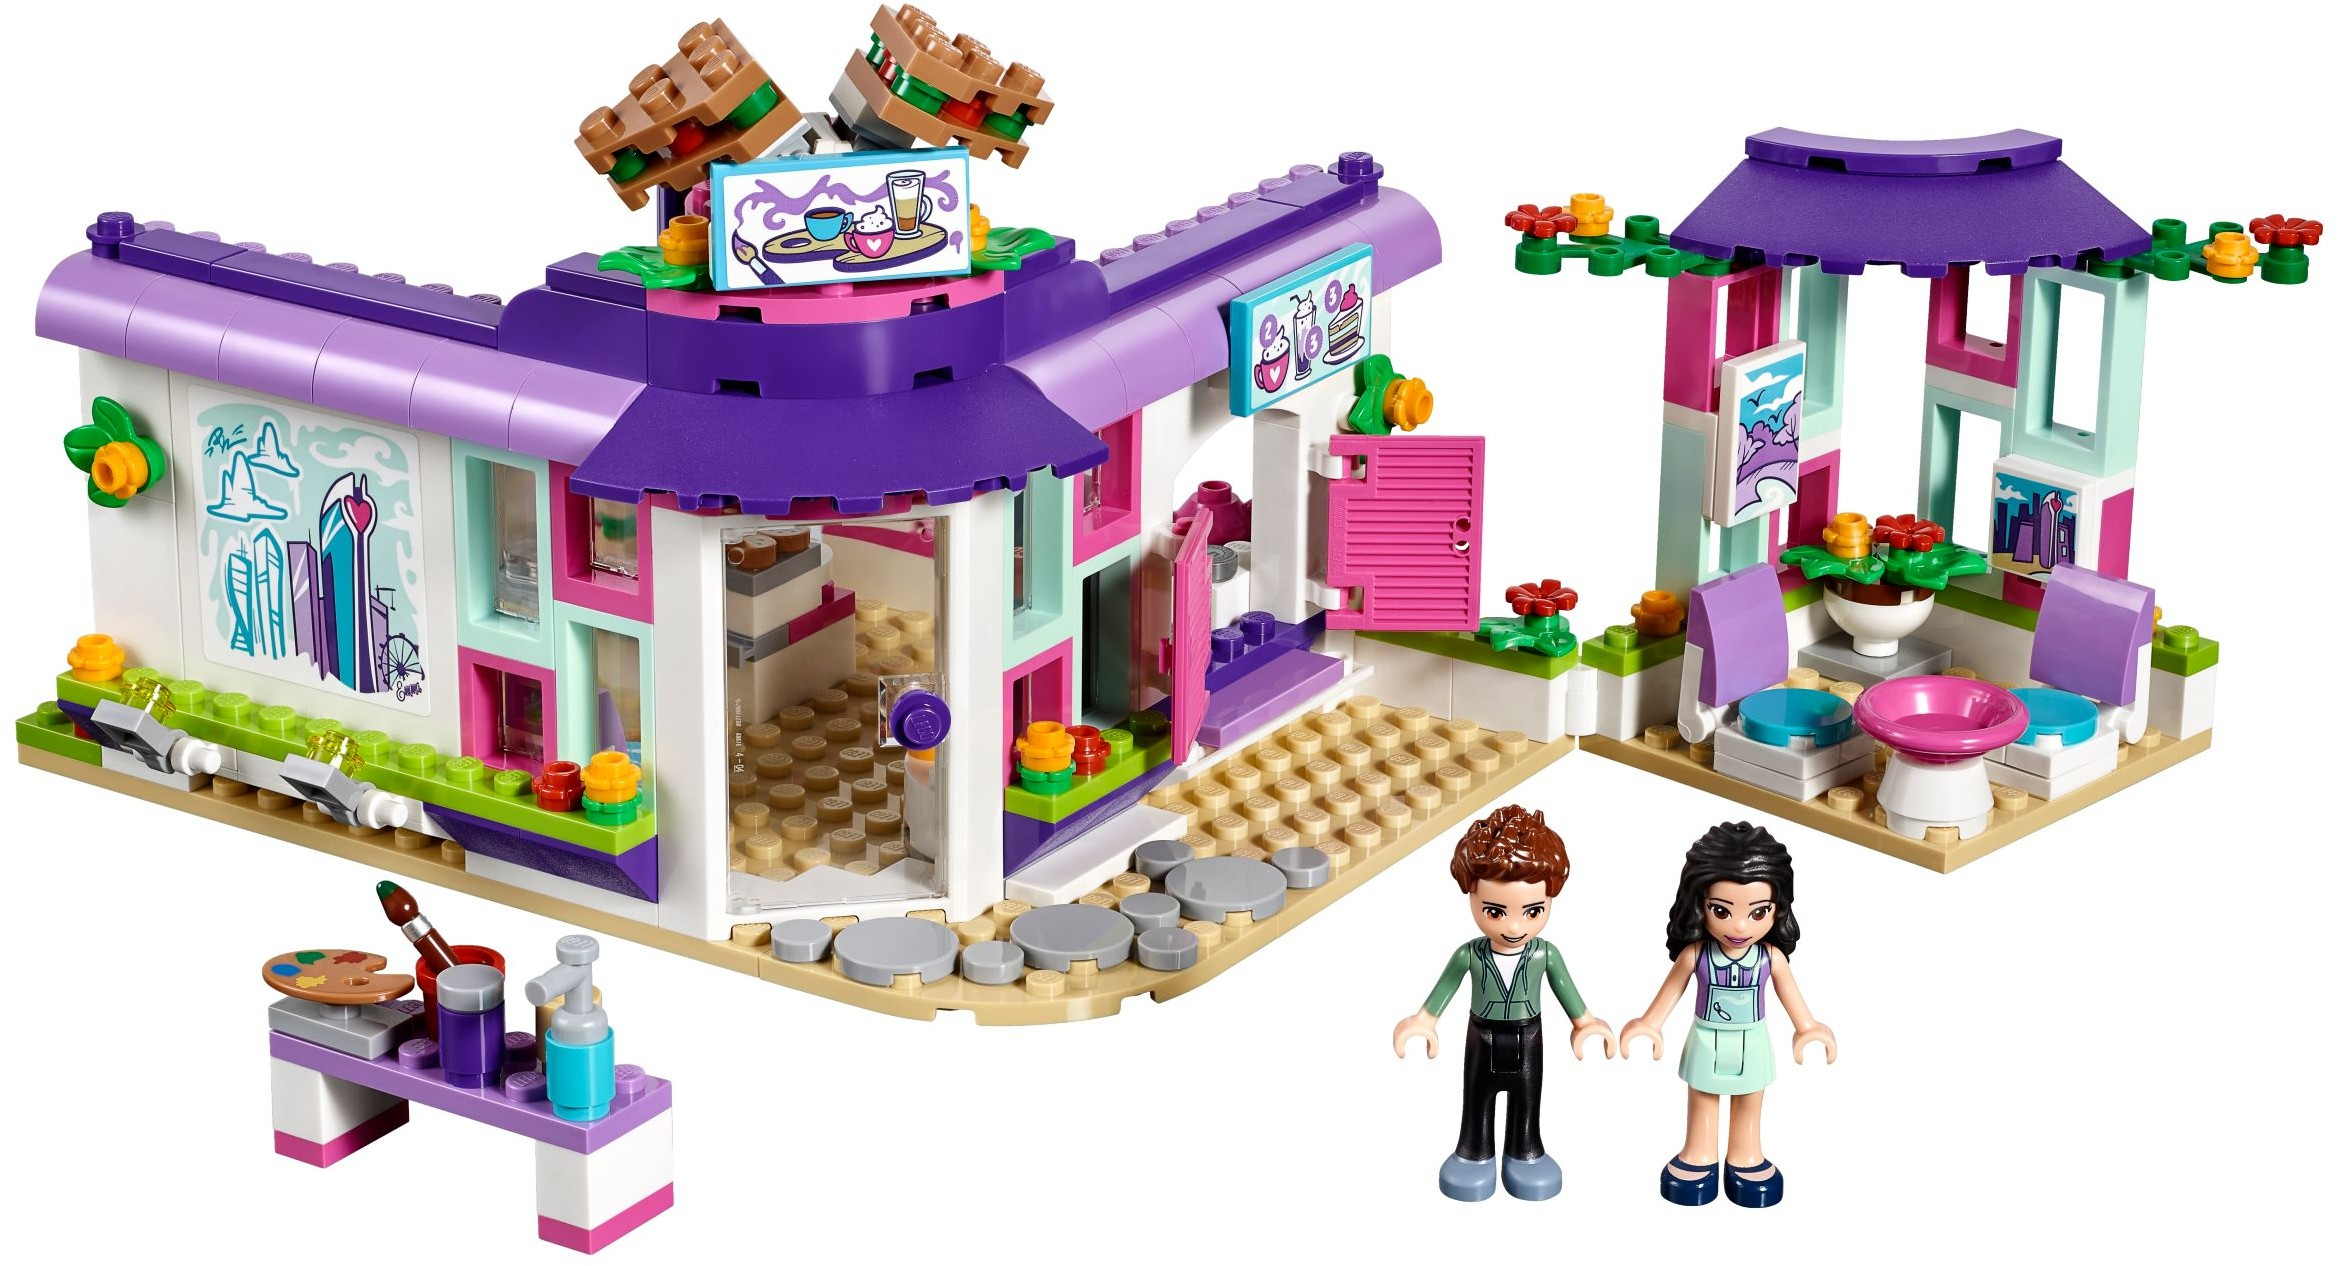 Friends 2018 Brickset Lego Set Guide And Database